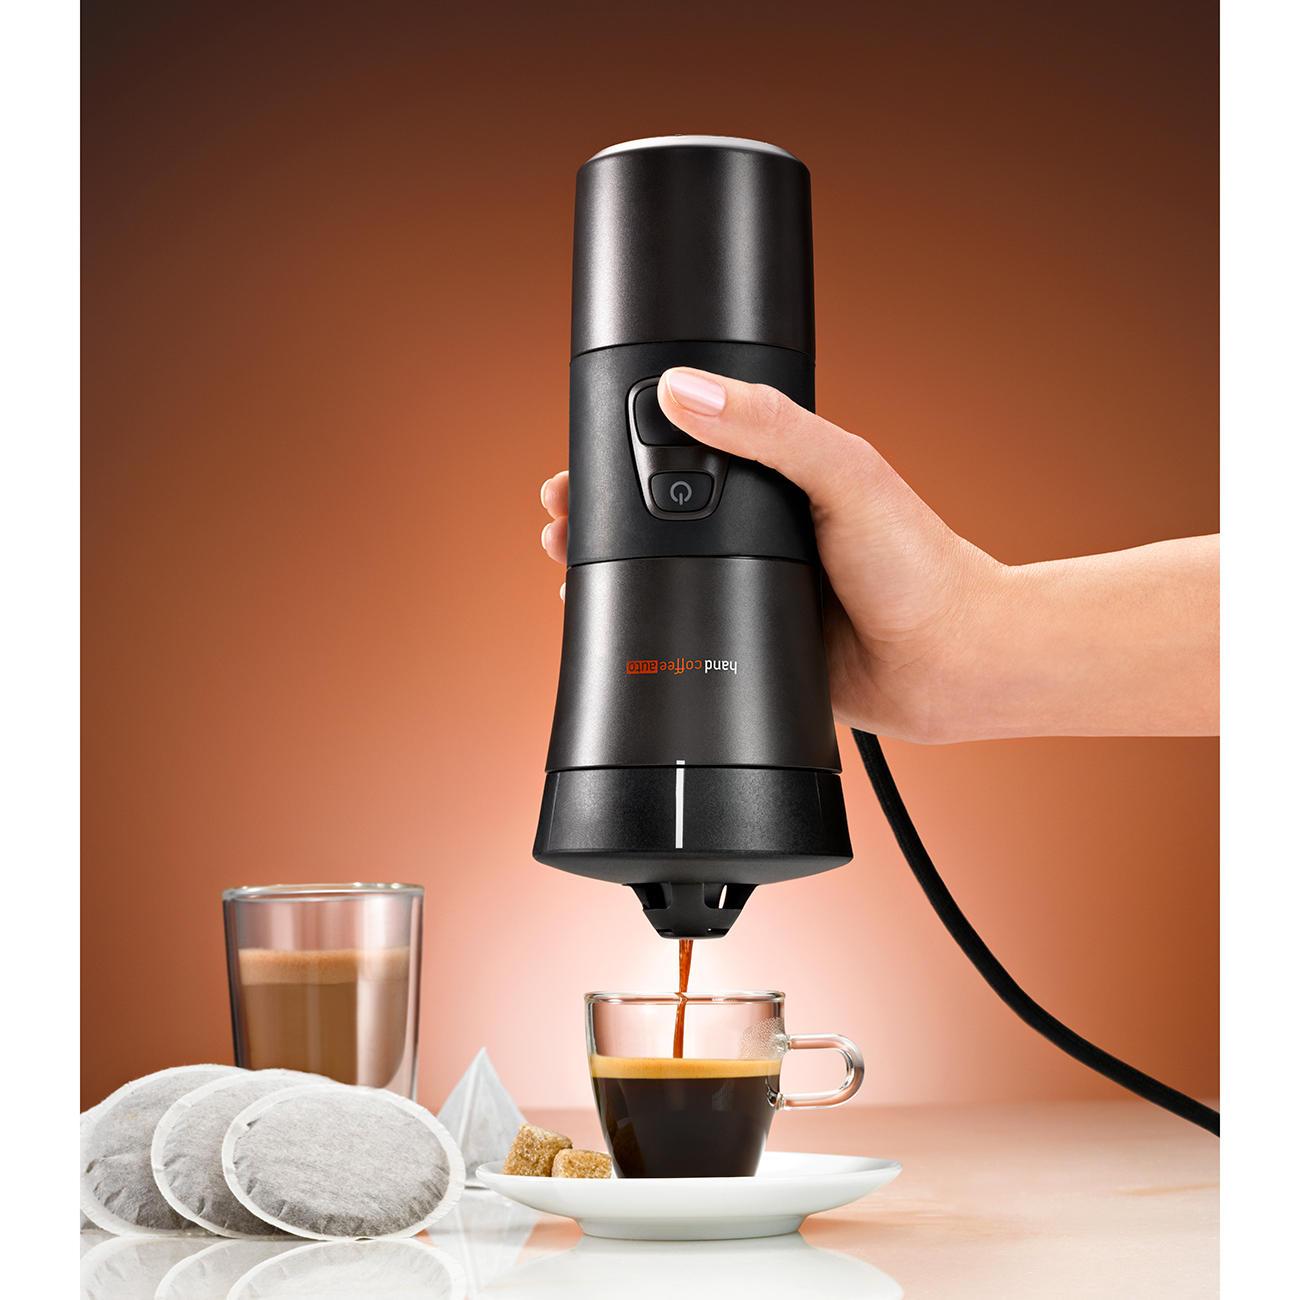 handcoffee mobile kaffeemaschine f r kaffepads 12 volt handpresso. Black Bedroom Furniture Sets. Home Design Ideas